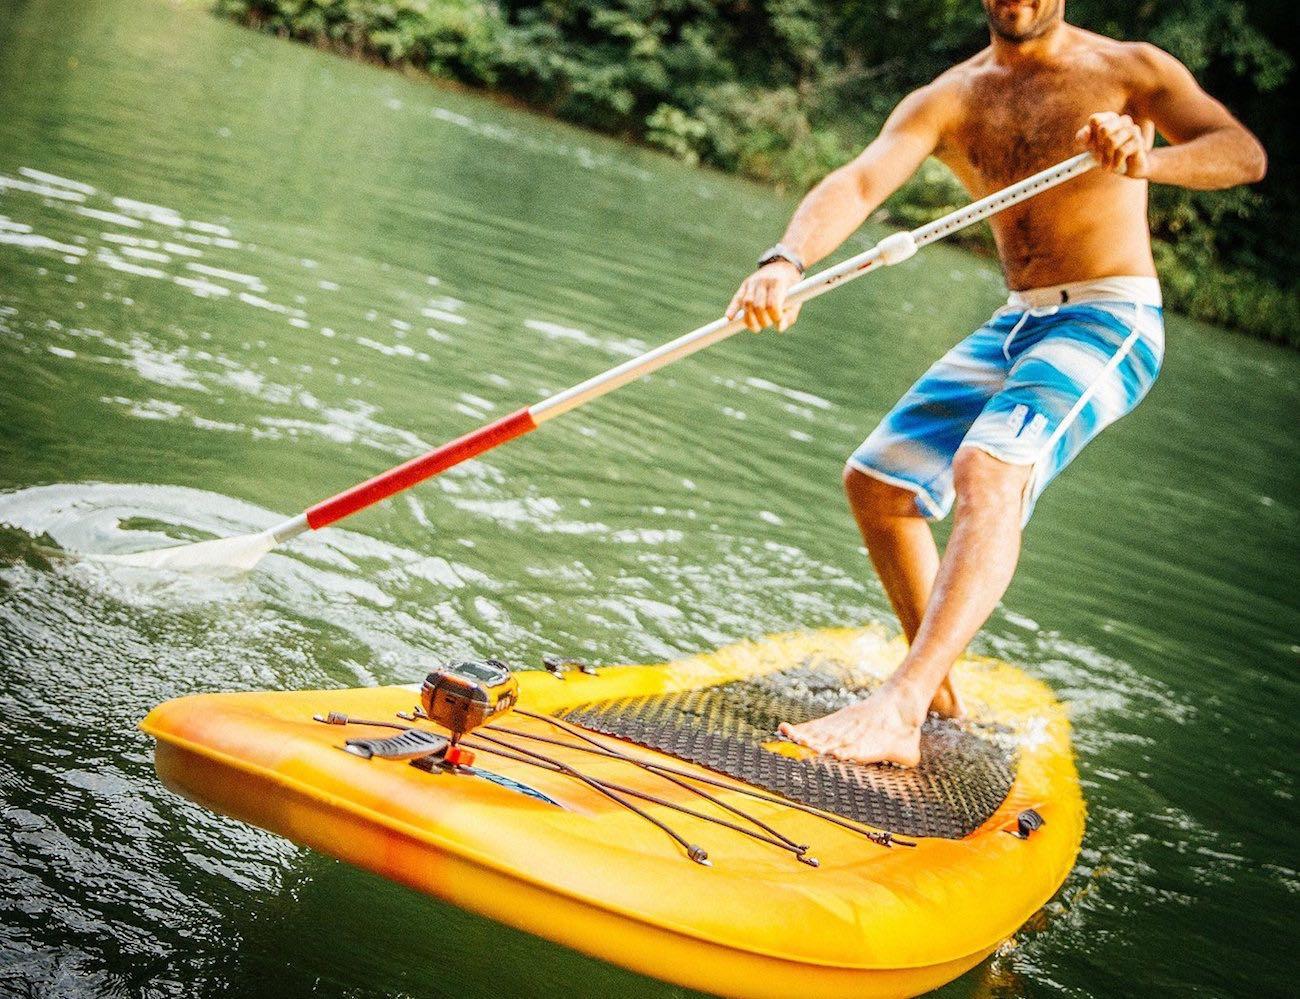 ricoh-wg-m1-waterproof-action-camera-05